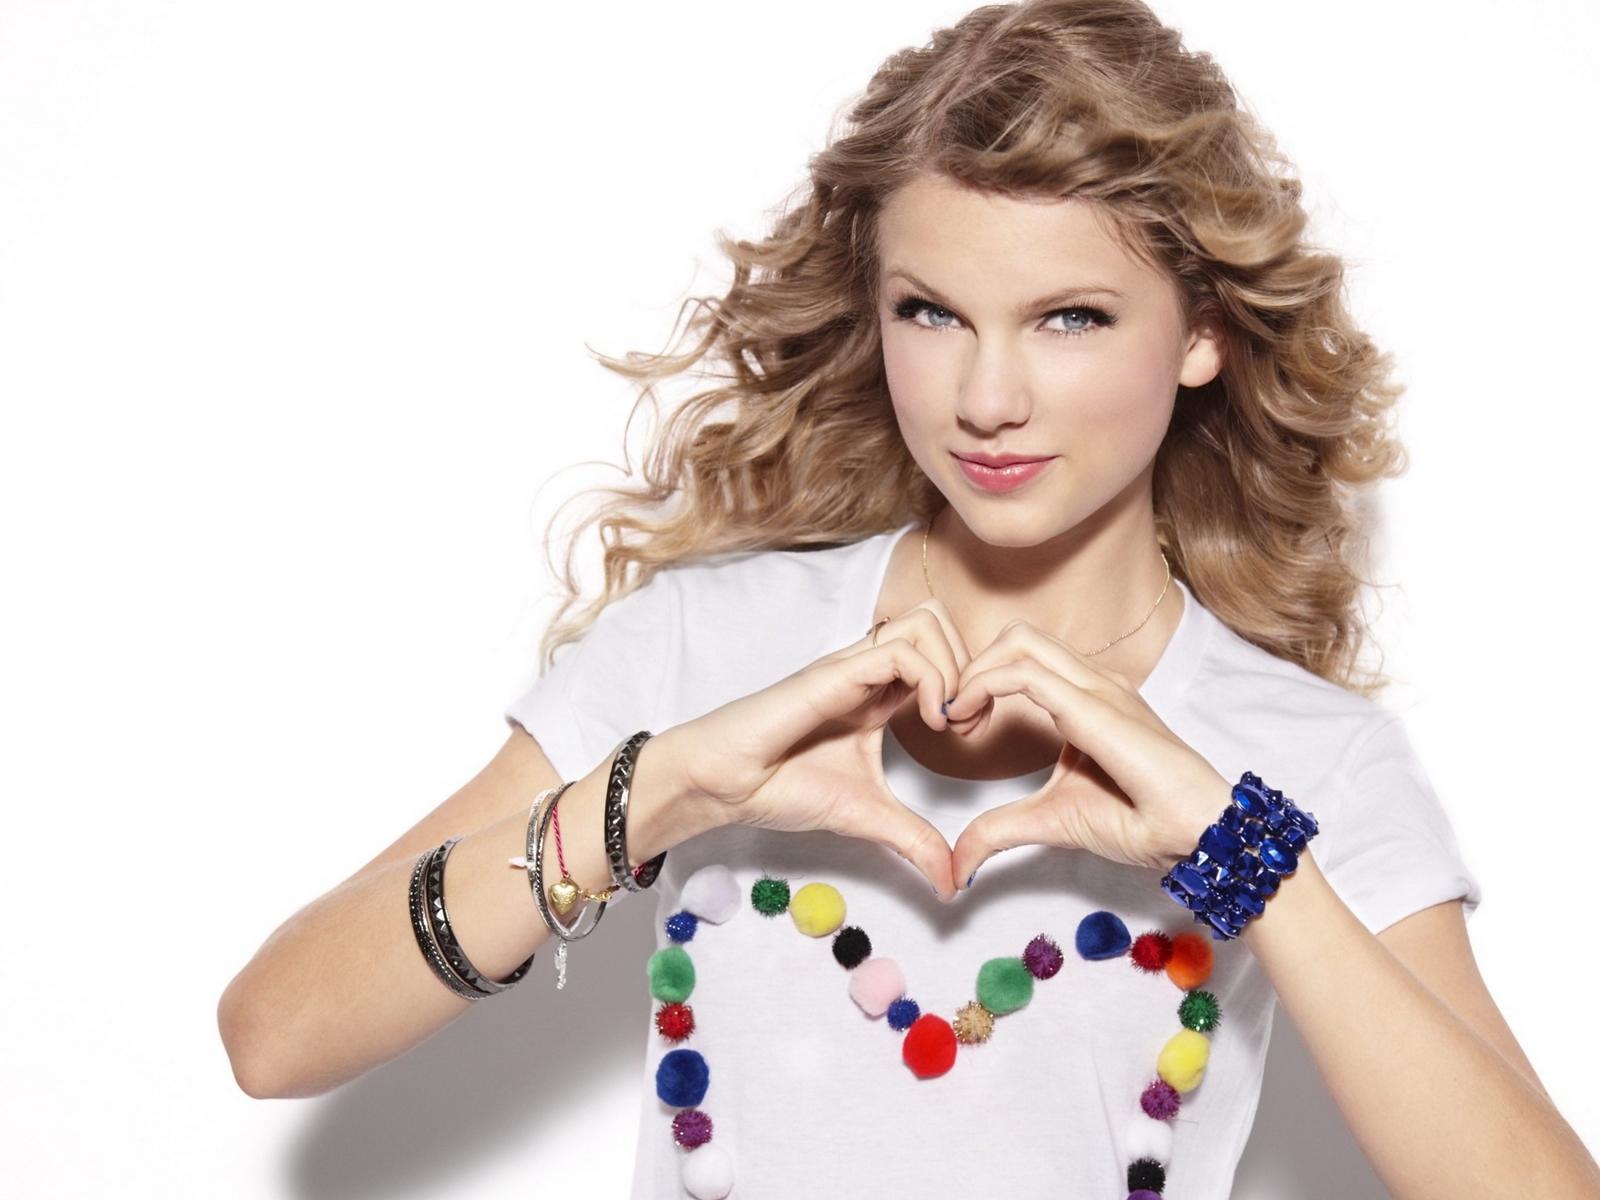 http://2.bp.blogspot.com/-hBncaeA00kM/UMvBvLK8t1I/AAAAAAAAPP0/Zzl8SQeqzP4/s1600/Taylor_Swift_new_Wallpaper_2012_03.jpg